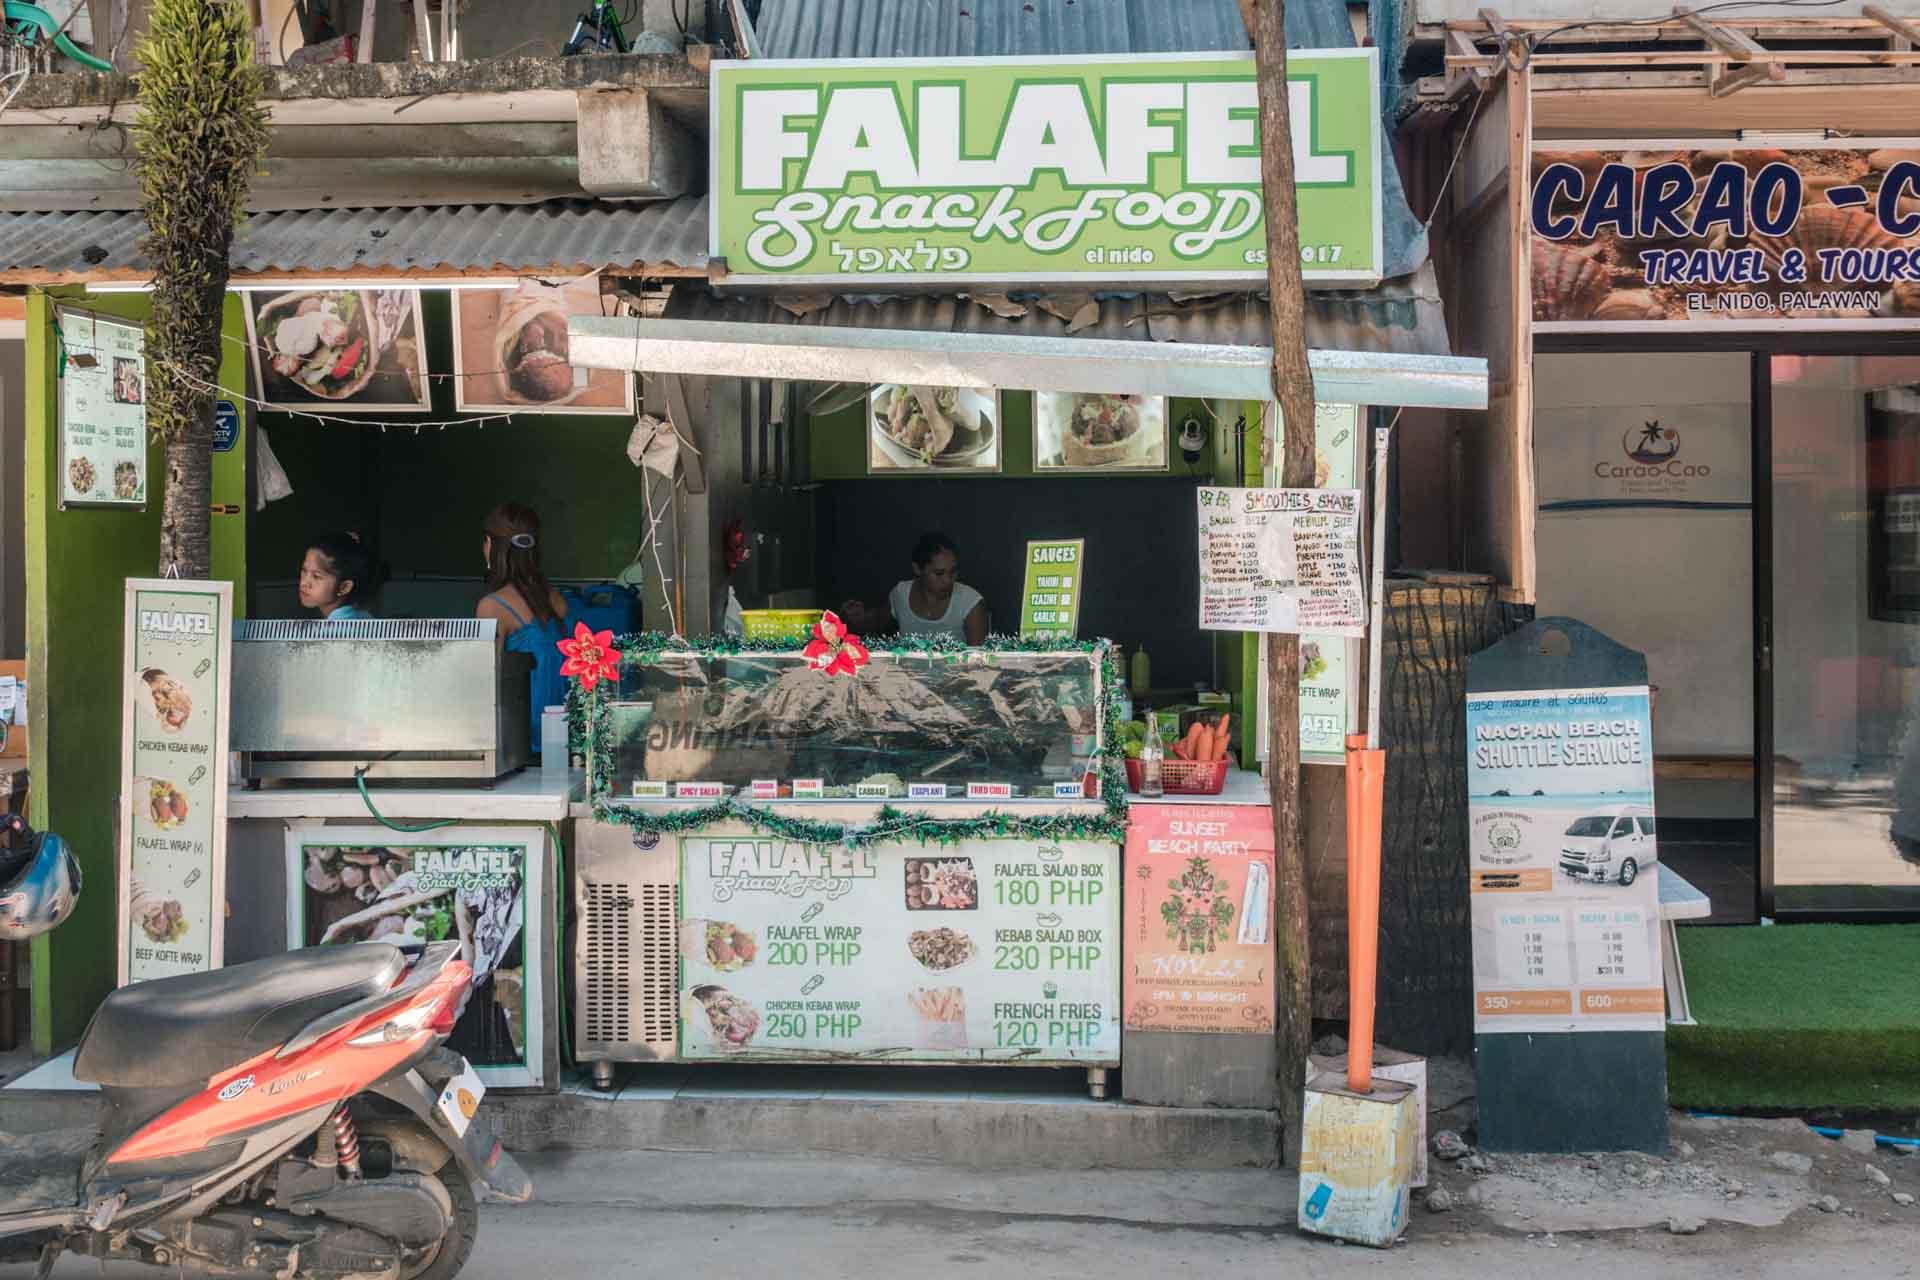 Falafel stand in El Nido Town